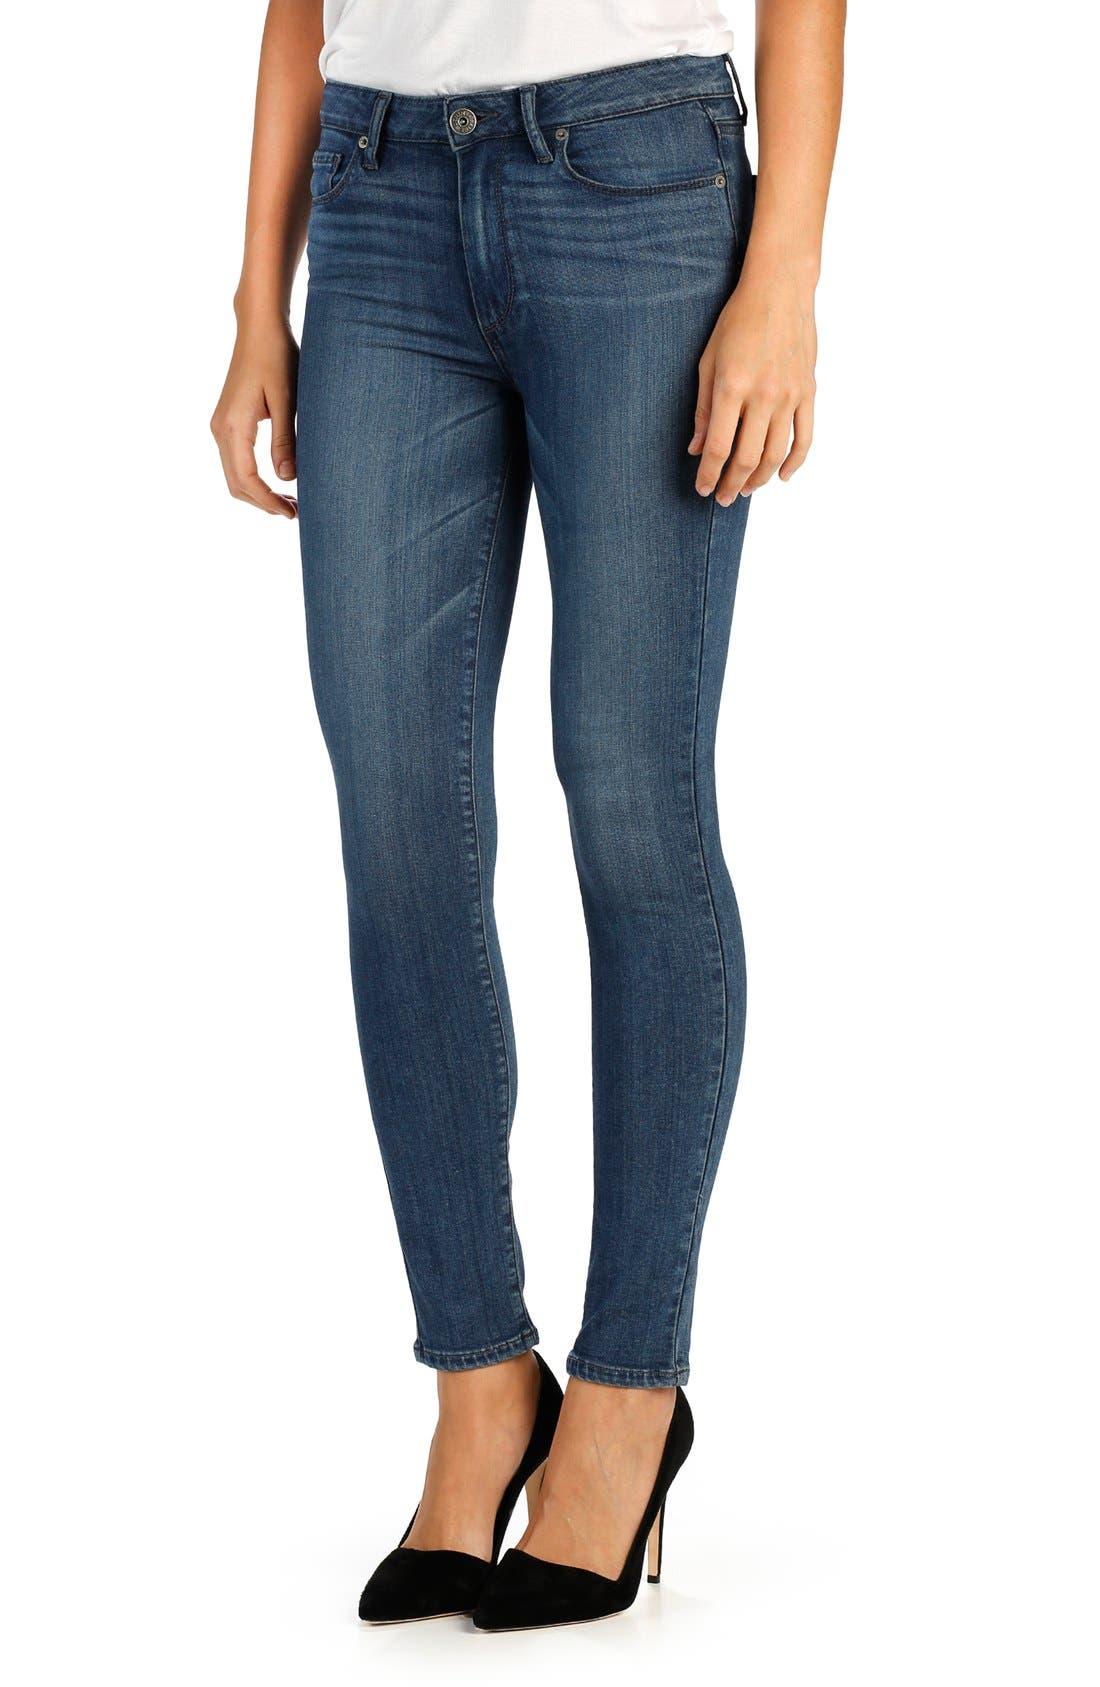 'Transcend - Hoxton' High Rise Ankle Peg Skinny Jeans, Main, color, 400